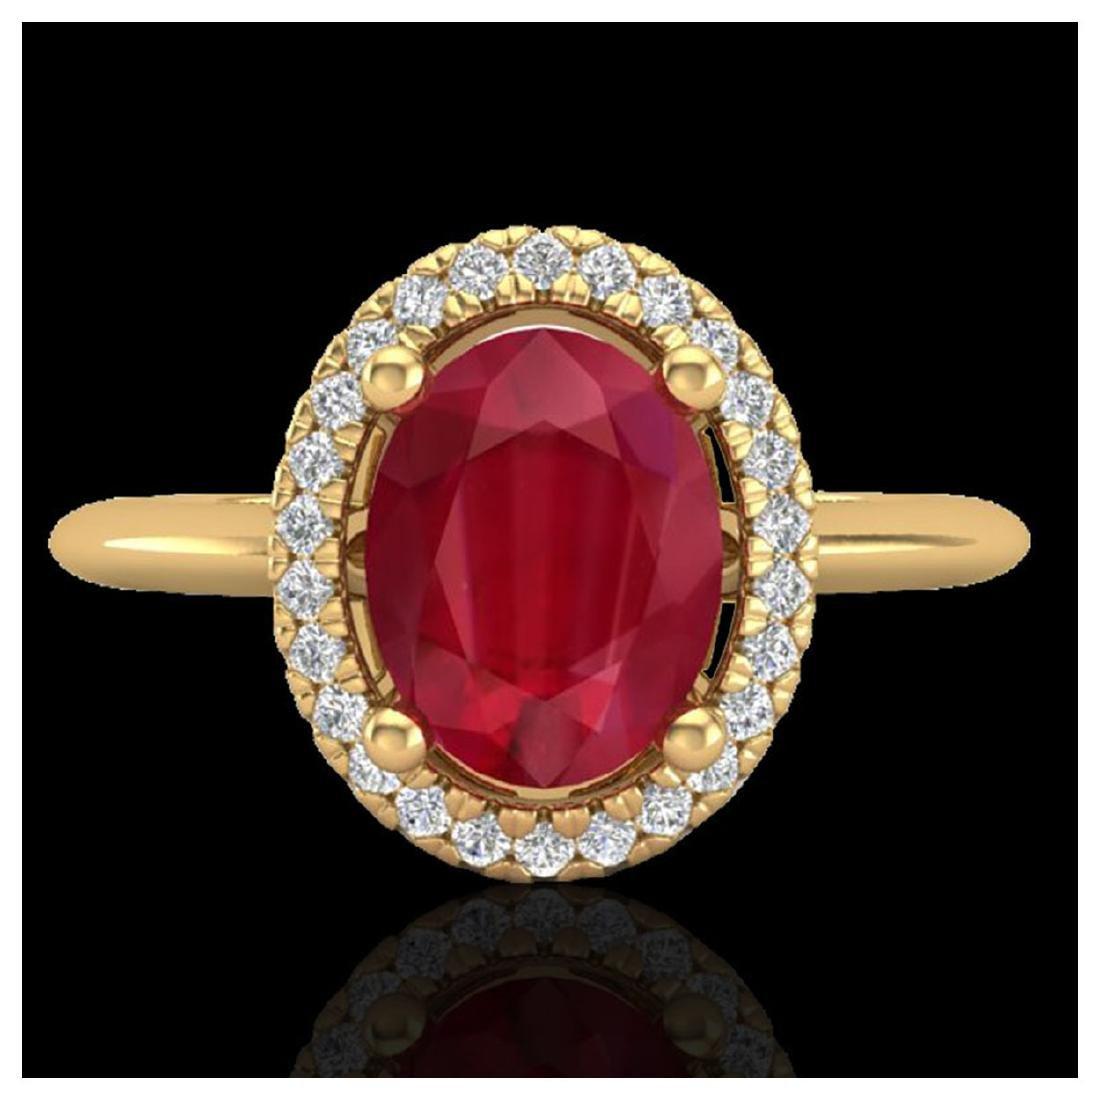 2 ctw Ruby & VS/SI Diamond Ring Halo 18K Yellow Gold -